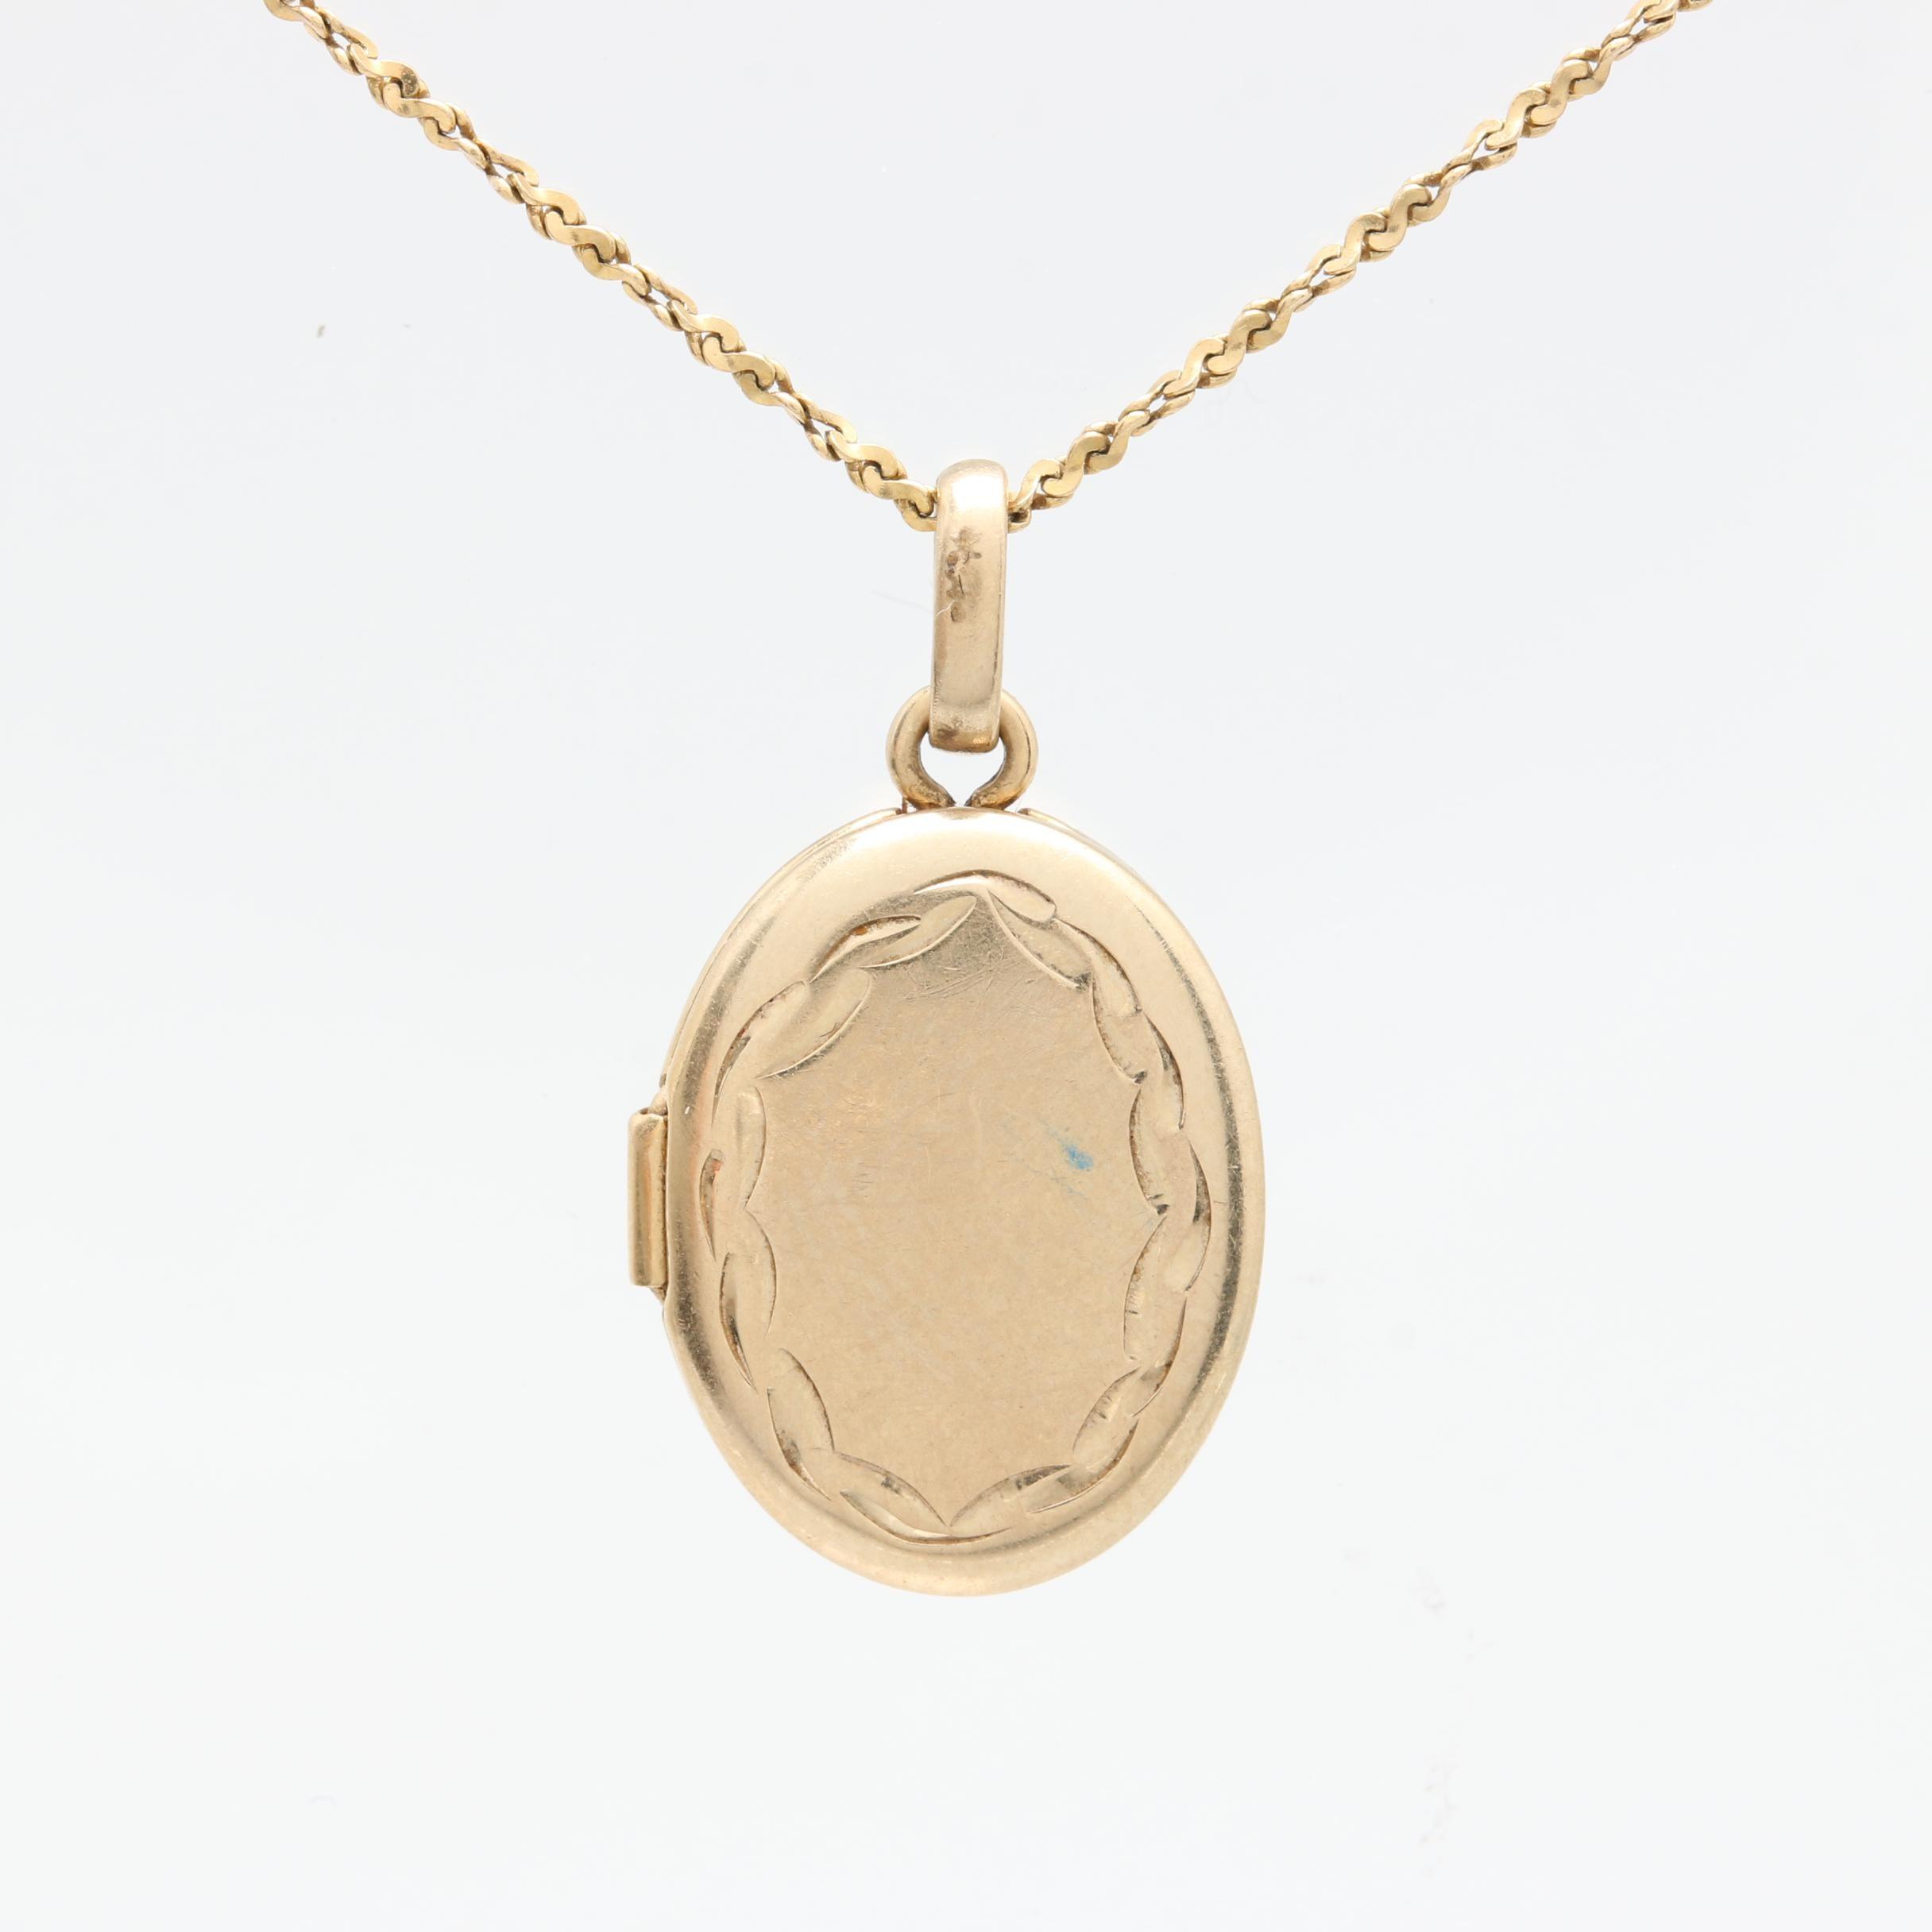 14K Yellow Gold Locket Pendant Necklace